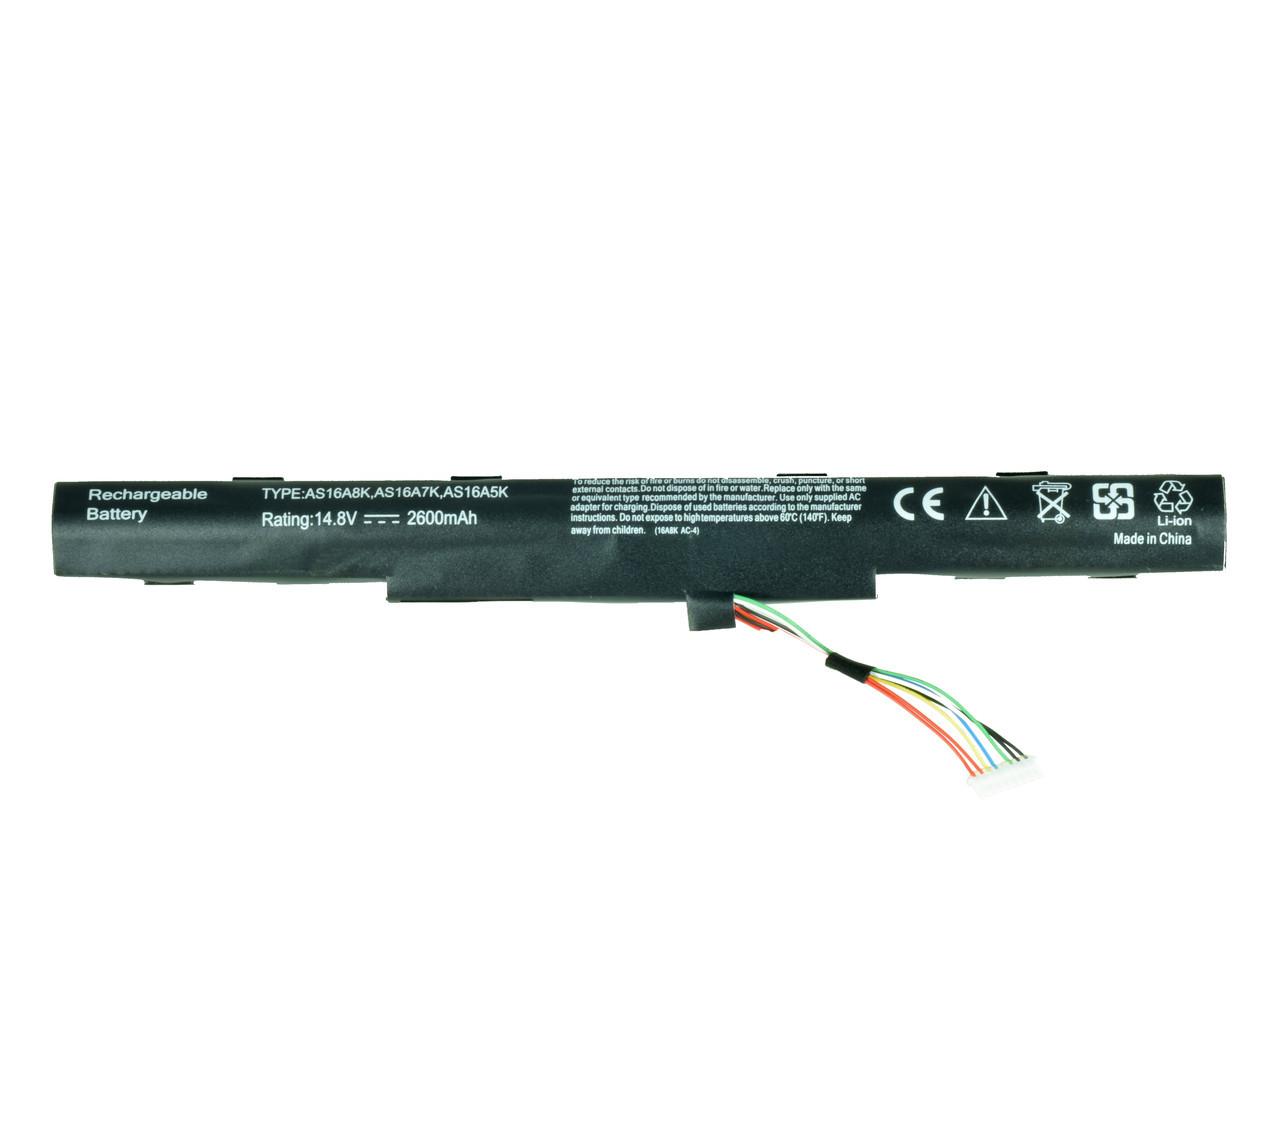 Батарея для ноутбука ACER AS16A8K AS16A5K AS16A7K 4ICR19/66